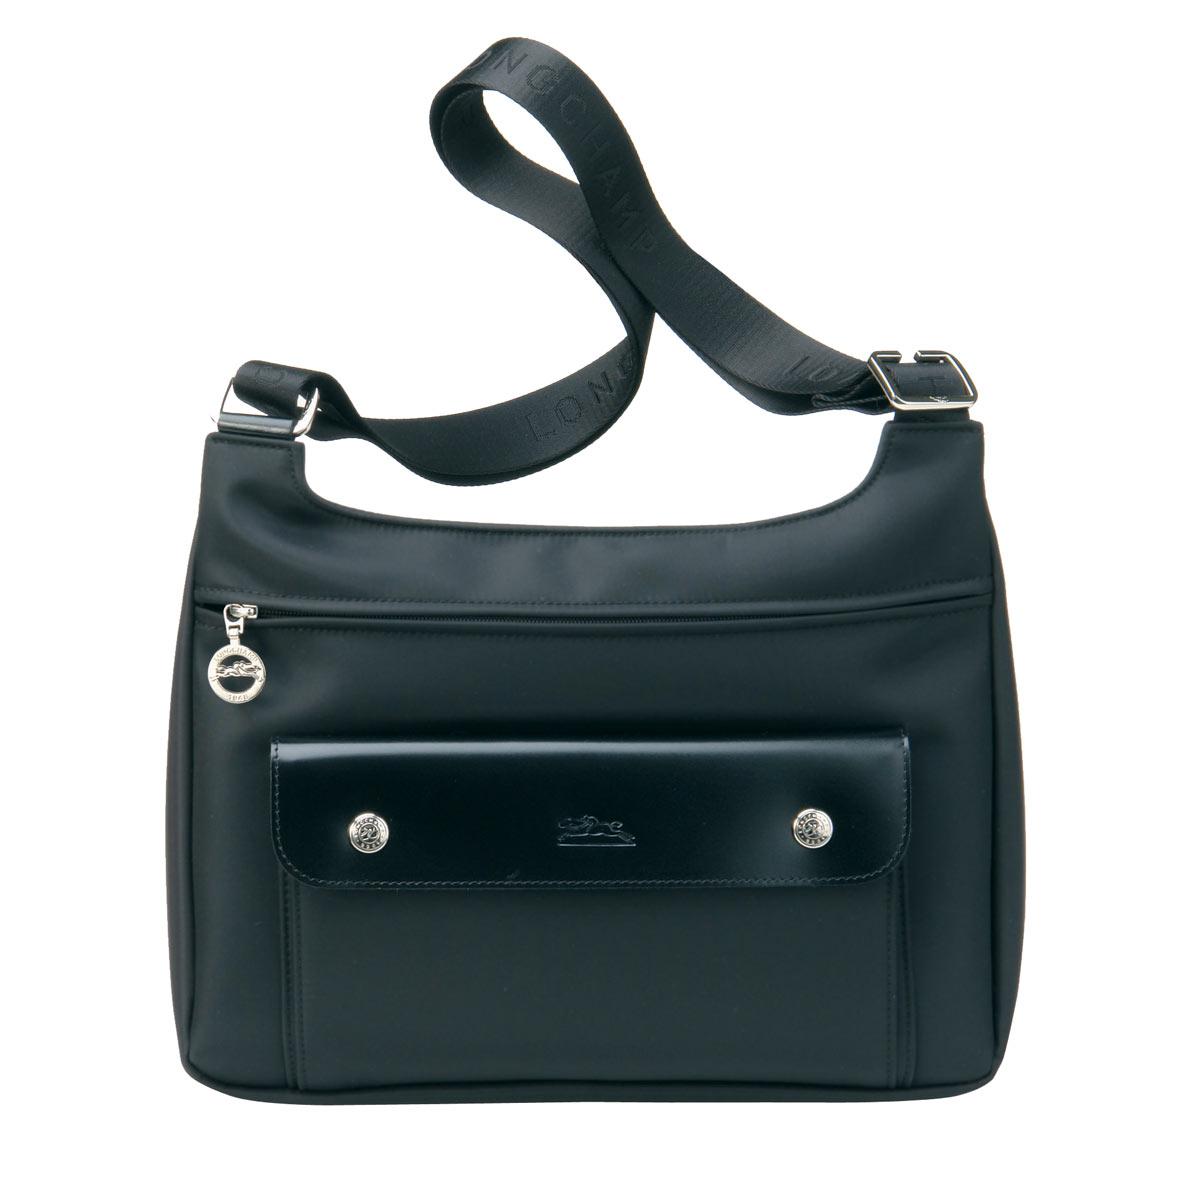 6851eeef758d Longchamp-Planetes-Messenger-Bag